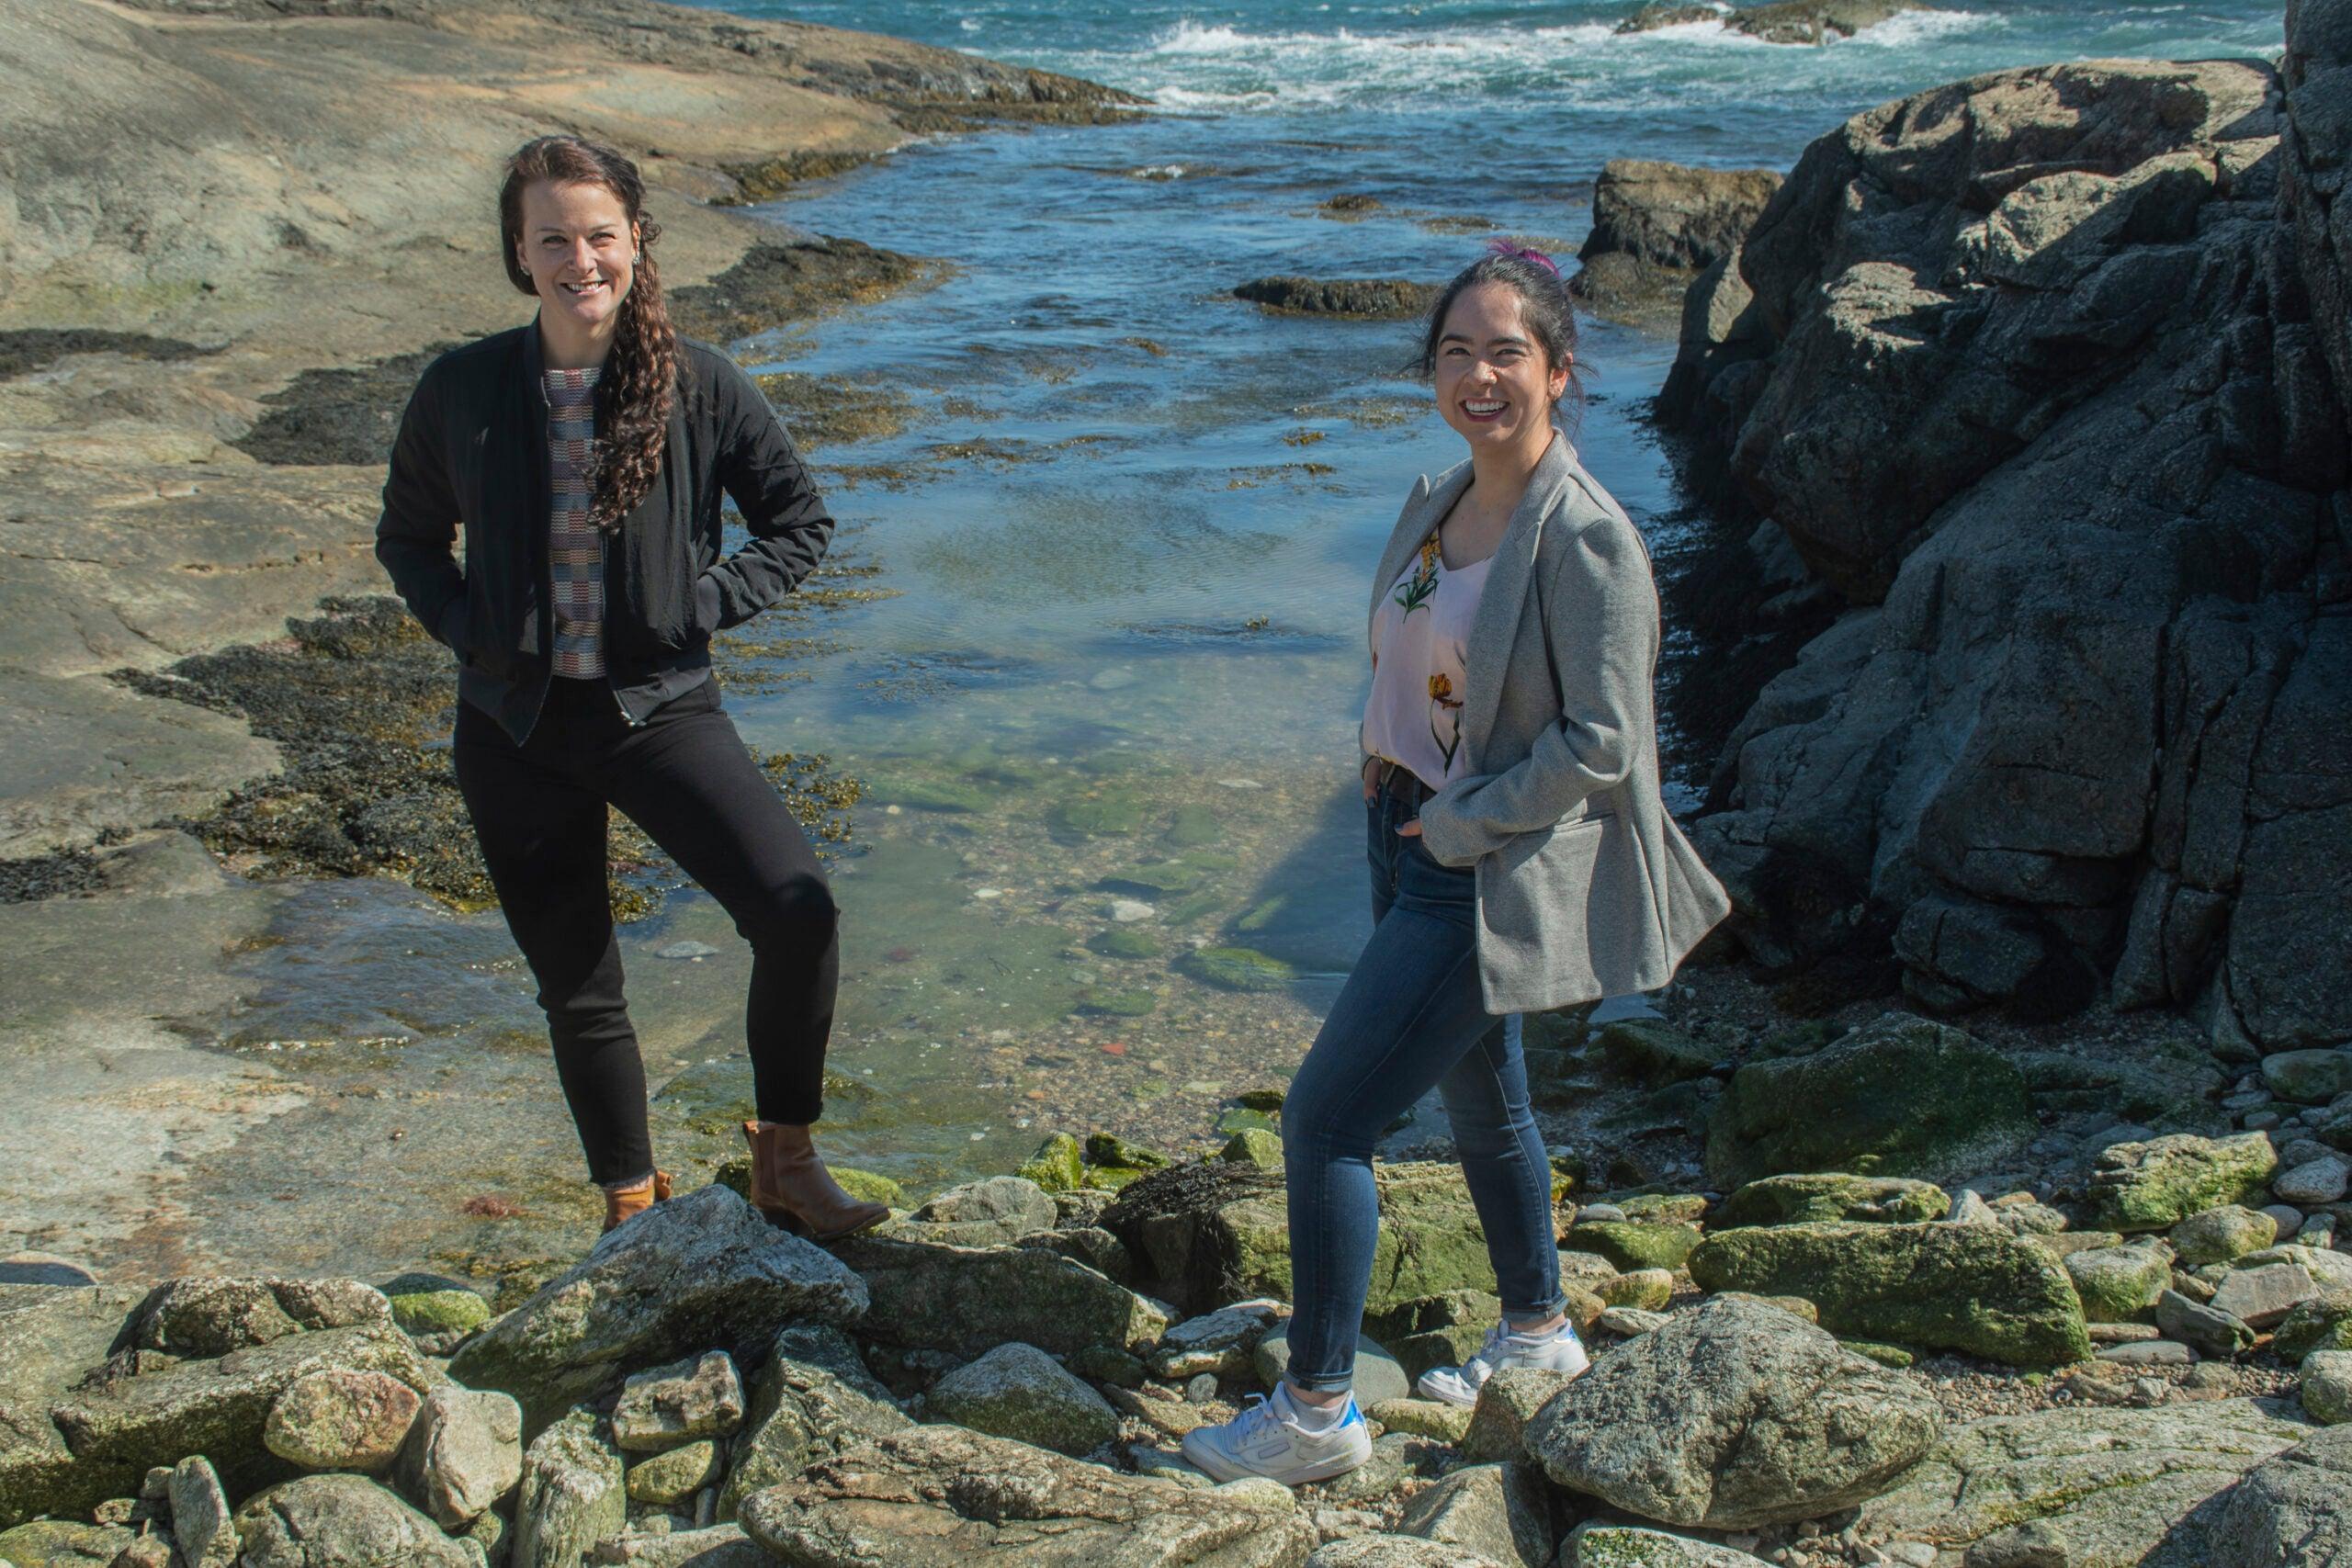 Beth Mendenhall, left and Eliya Baron Lopez. Photo by Nora Lewis